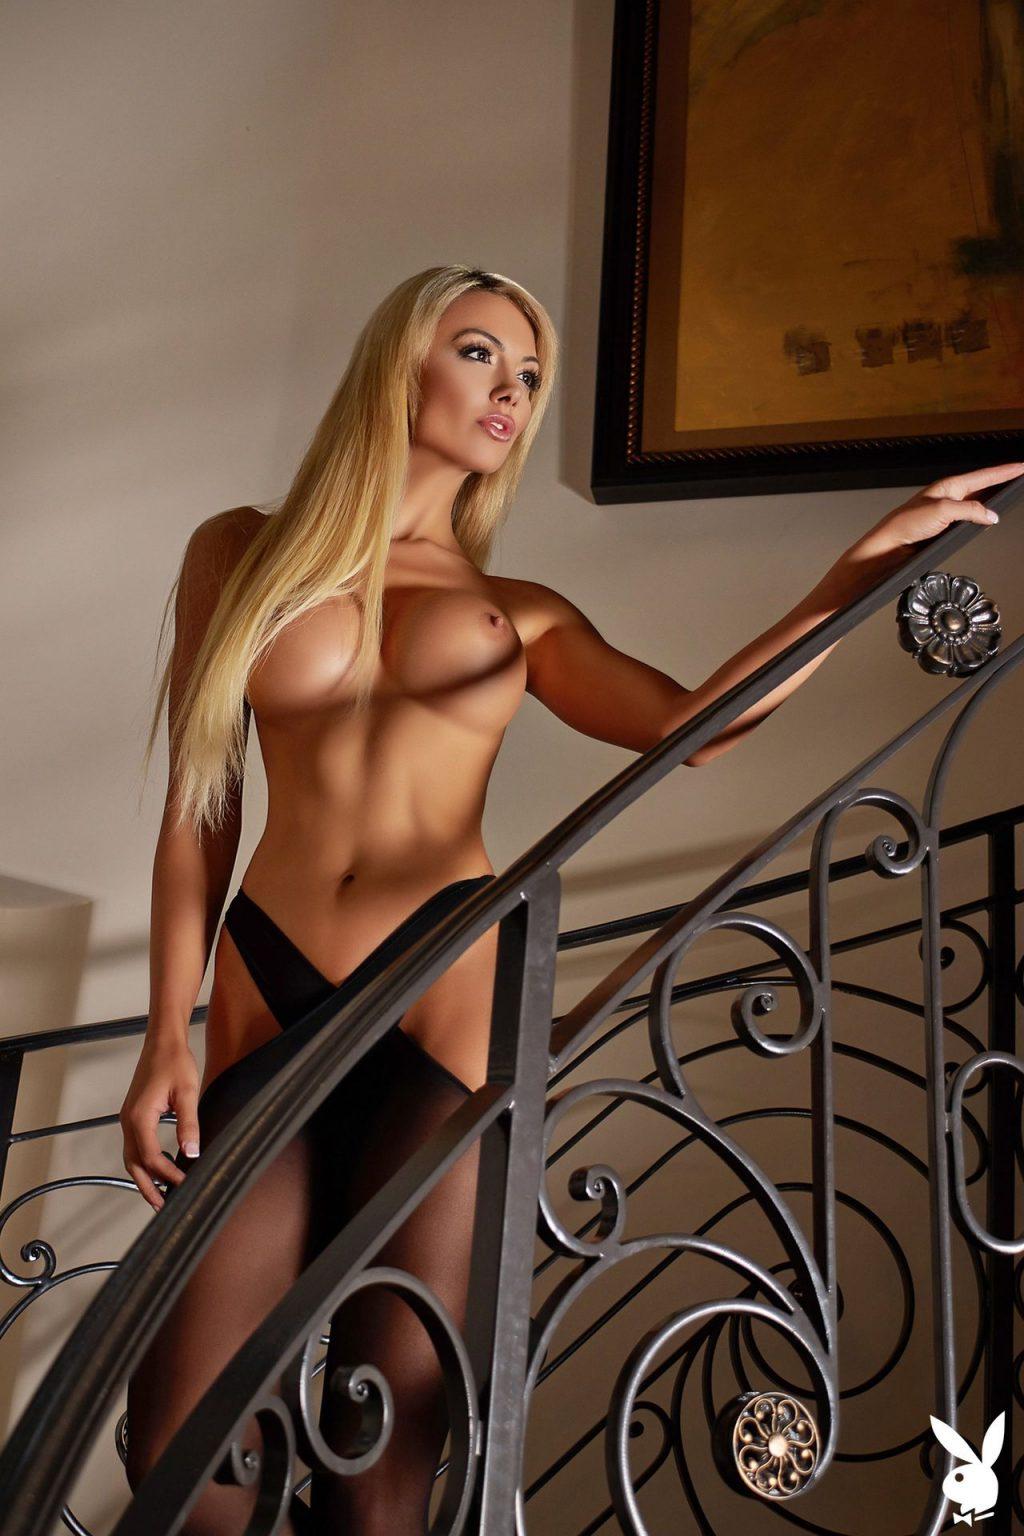 Ana Belen Topless bethany giura topless (5 photos) – ( ͡° ͜ʖ ͡°)  the